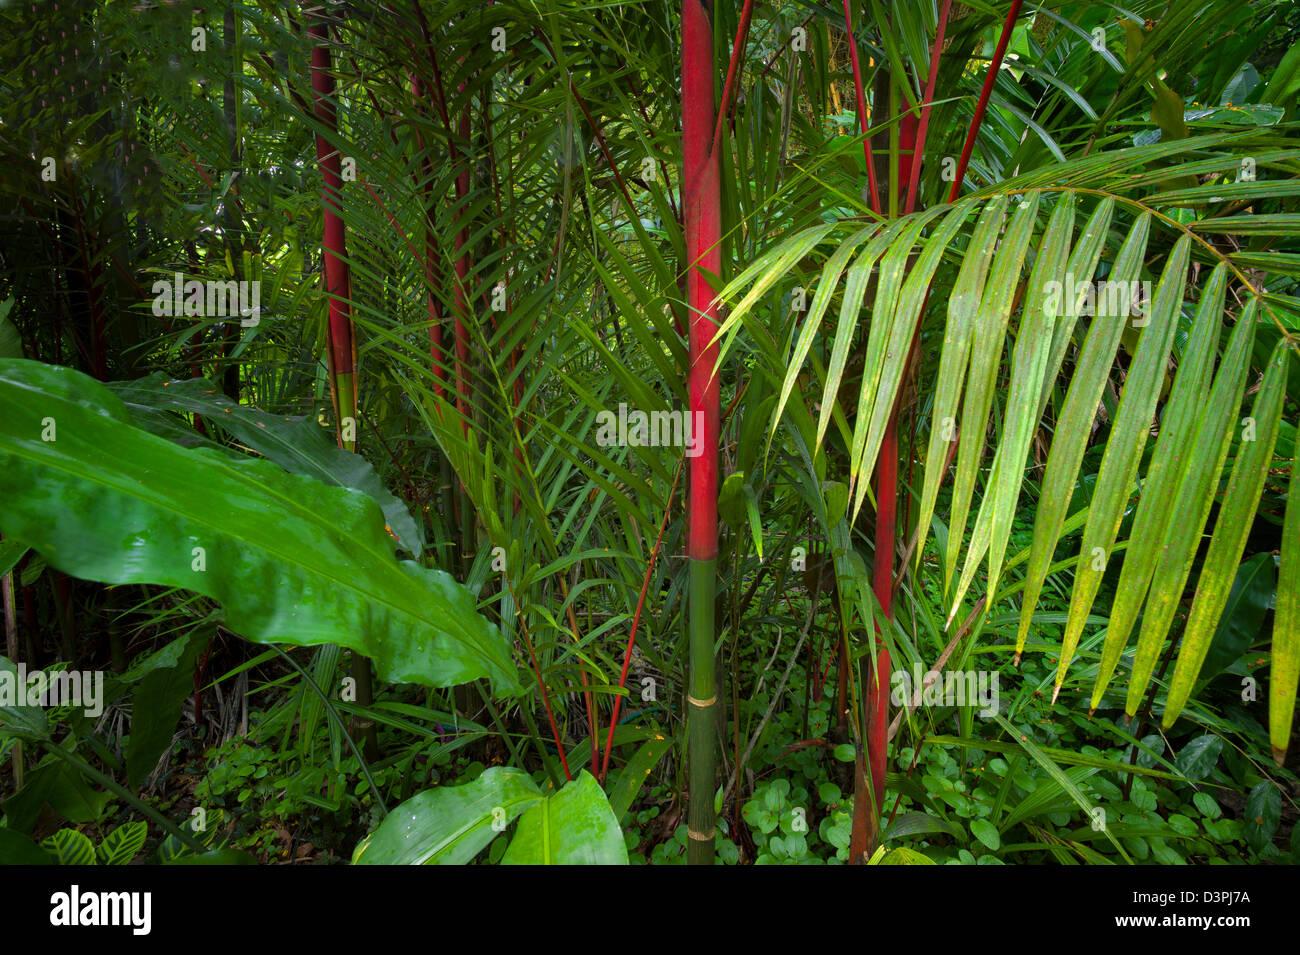 Rote Stämme der Abdichtung Wachs Palm. Hawaii Tropical Botanical Gardens. Hawaii, Big Island. Stockbild